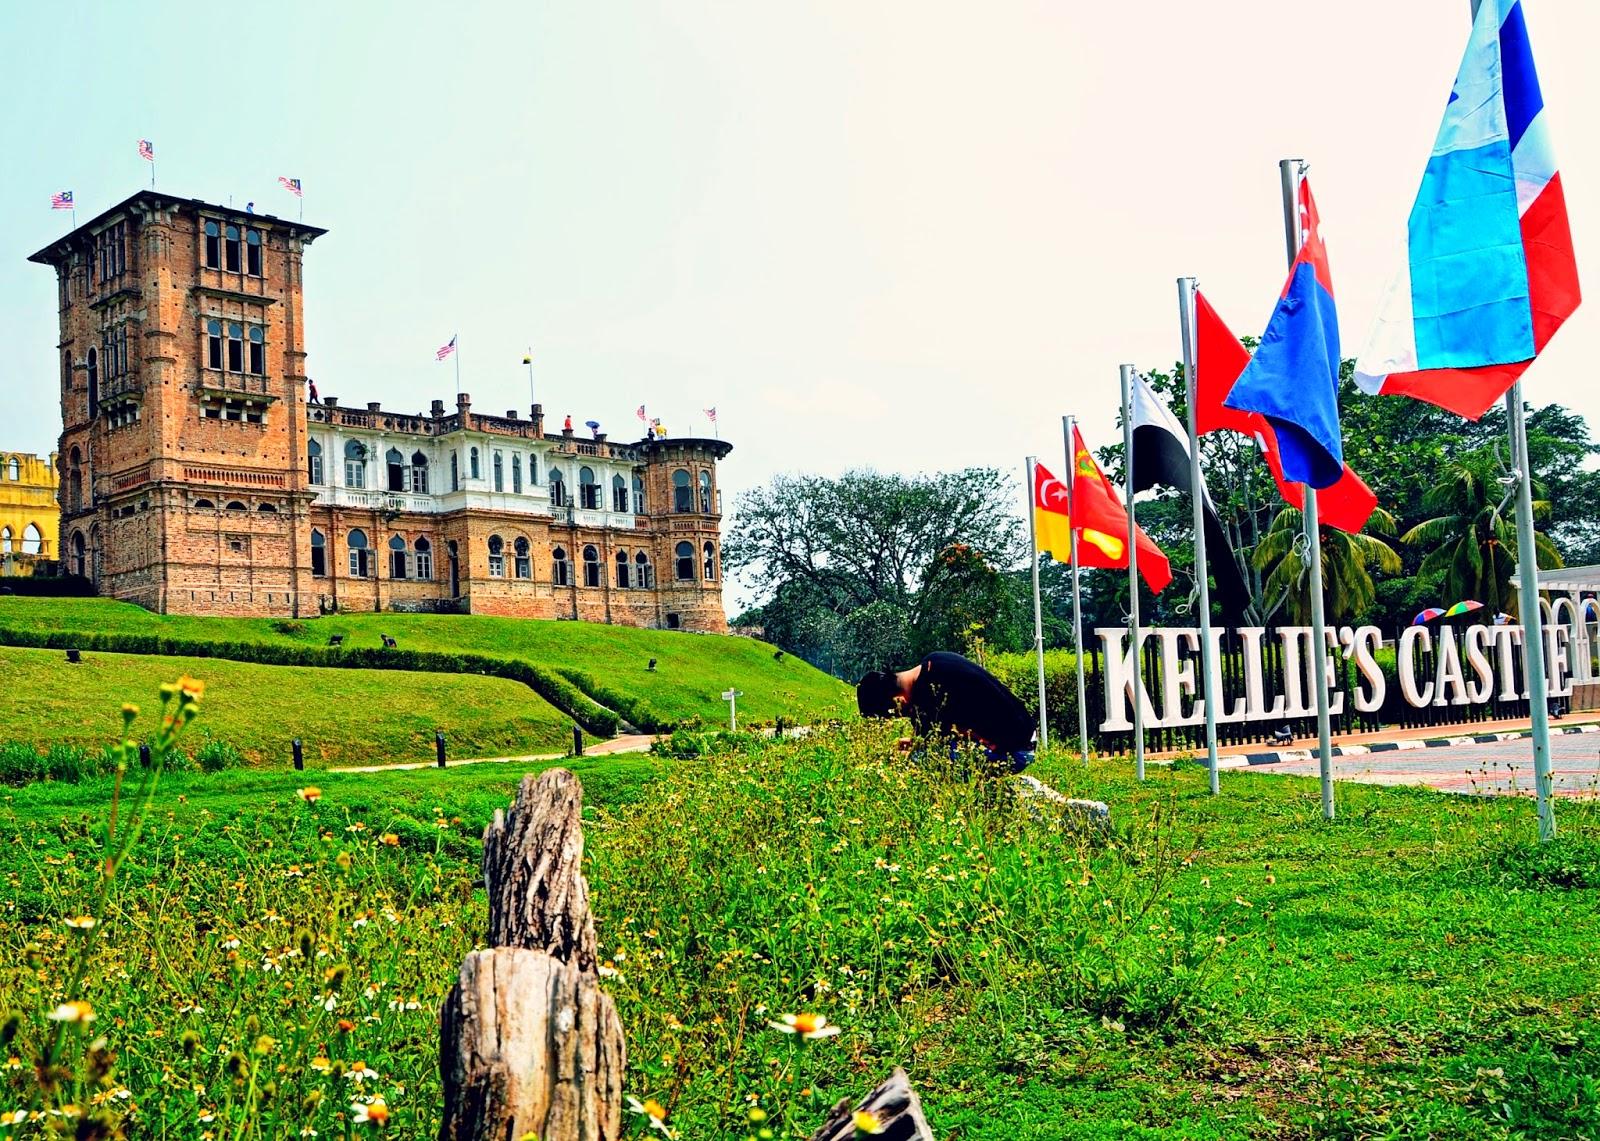 kellie's castle Kellie's castle malaysia, batu gajah 27k likes kellie's castle (sometimes also called kellie's folly) is located near batu gajah, and is about 20.